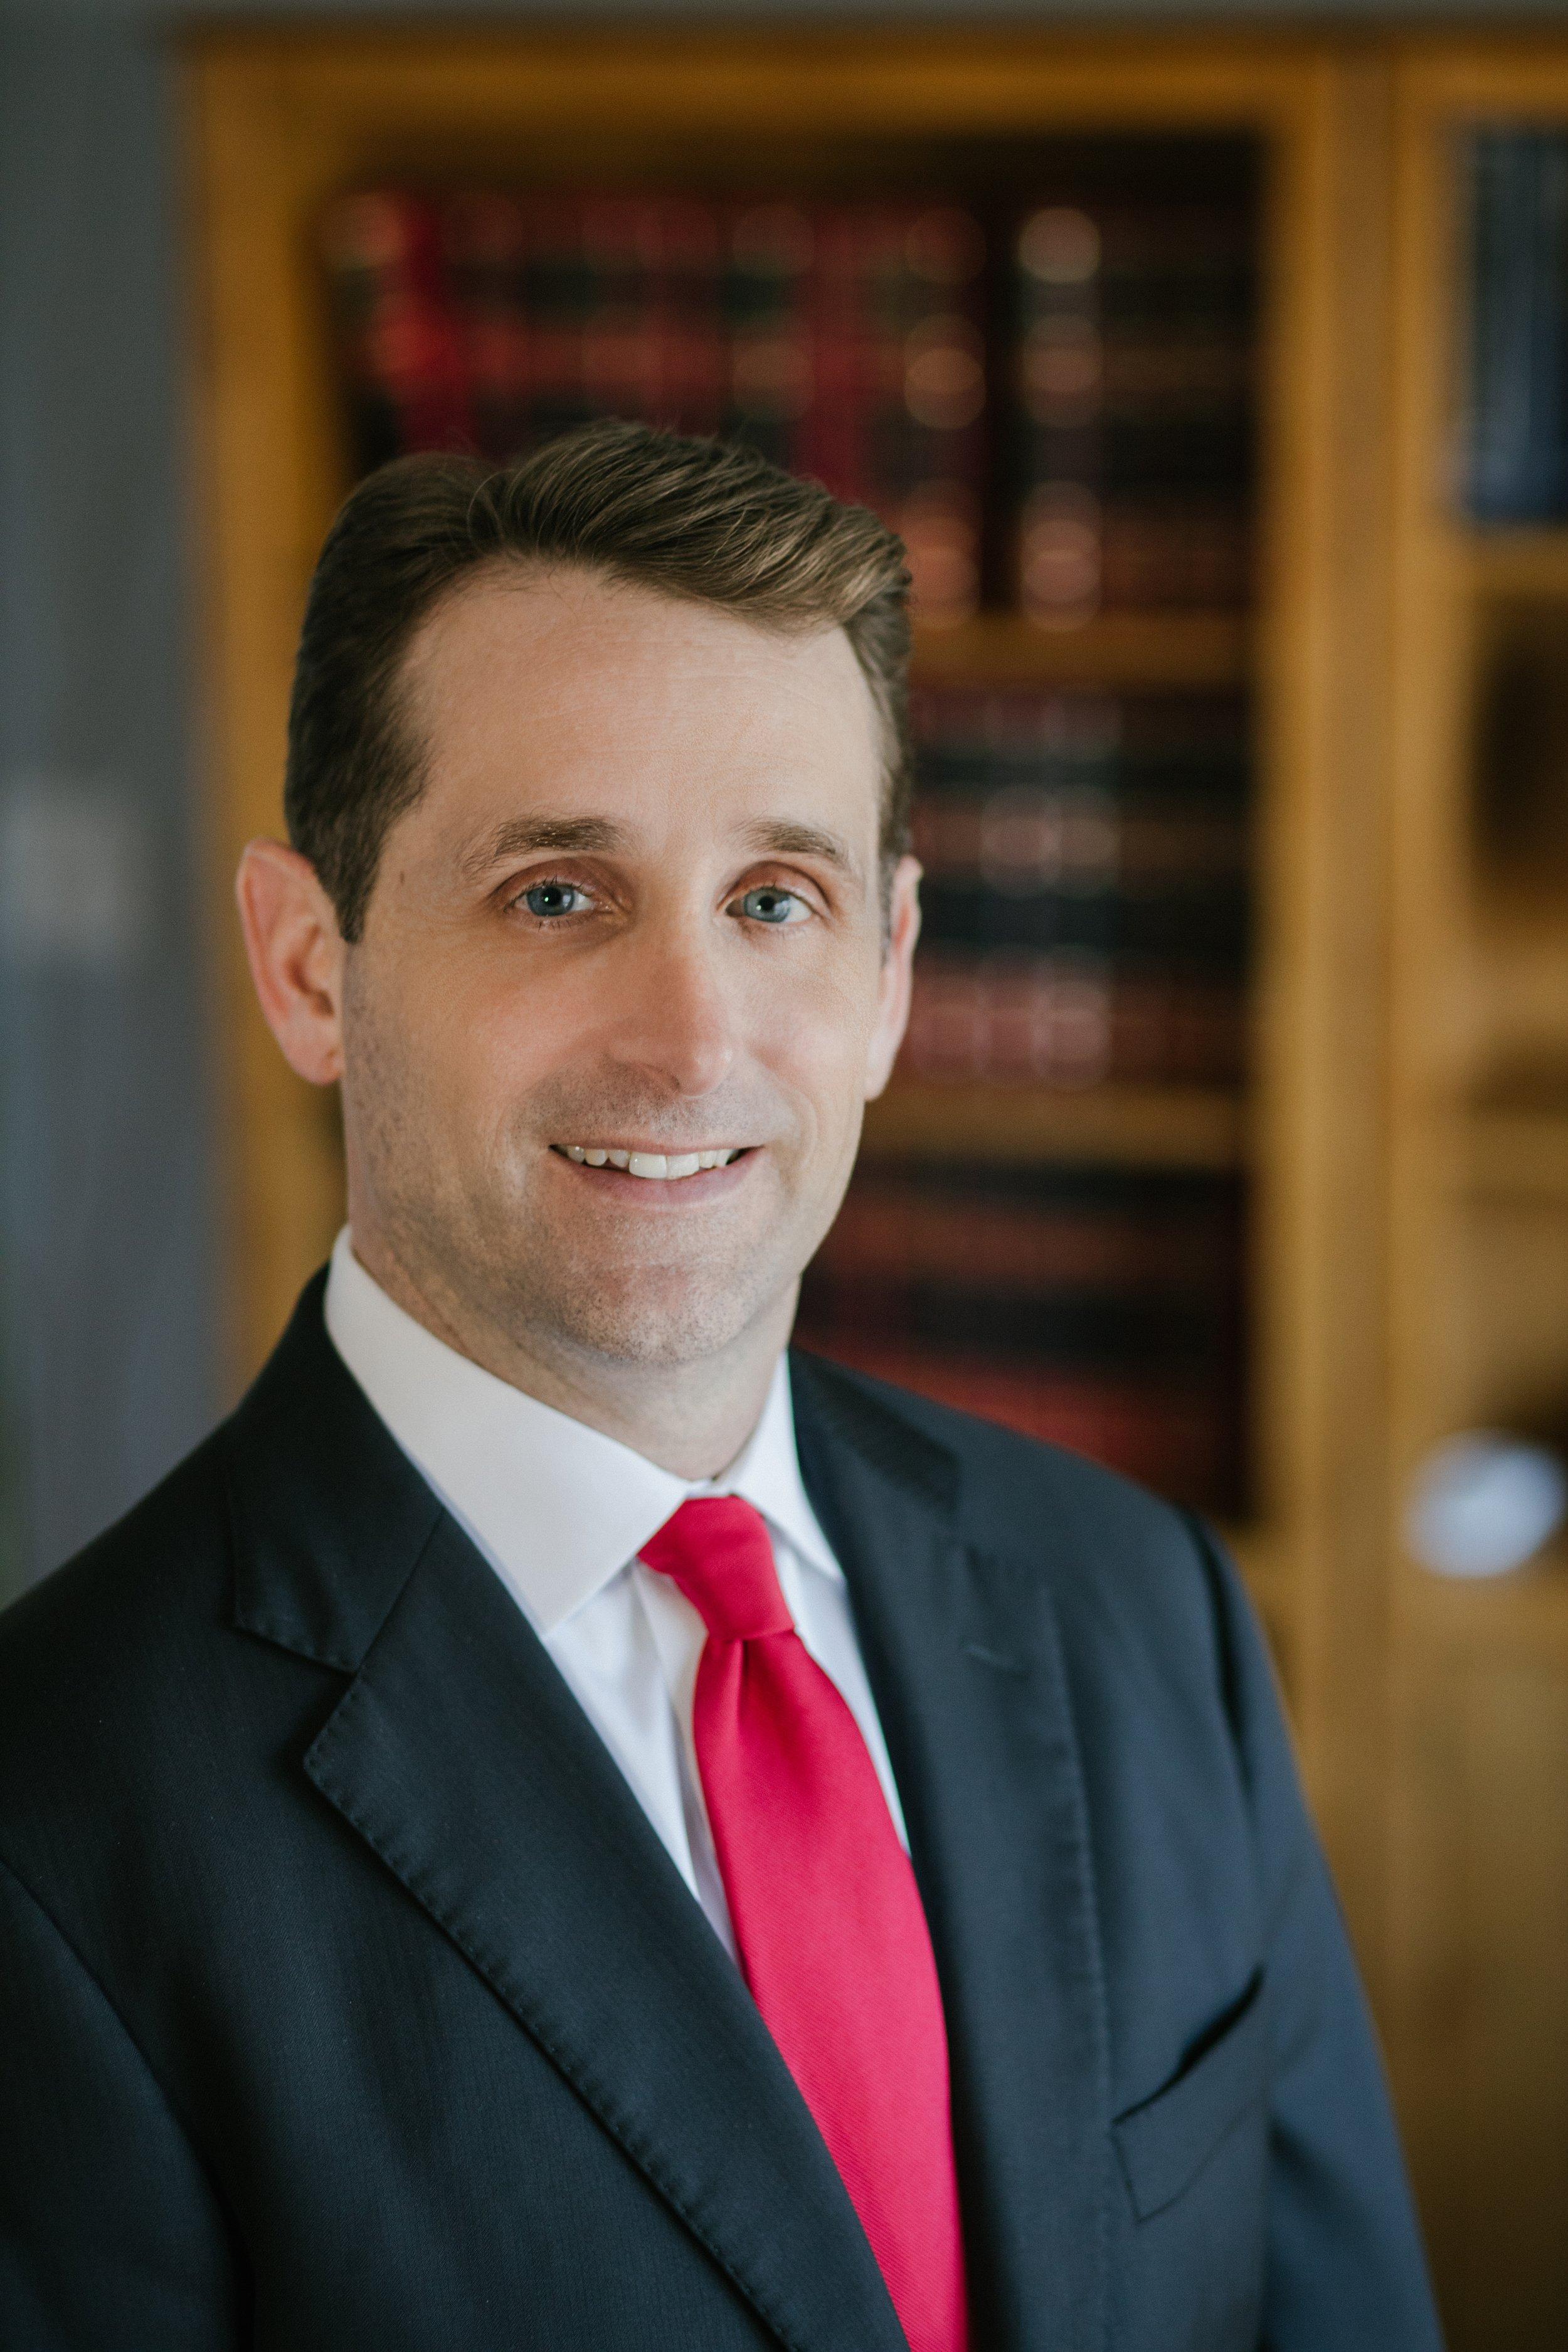 McManus Law Firm - Springdale Arkansas - 2019-4.jpg